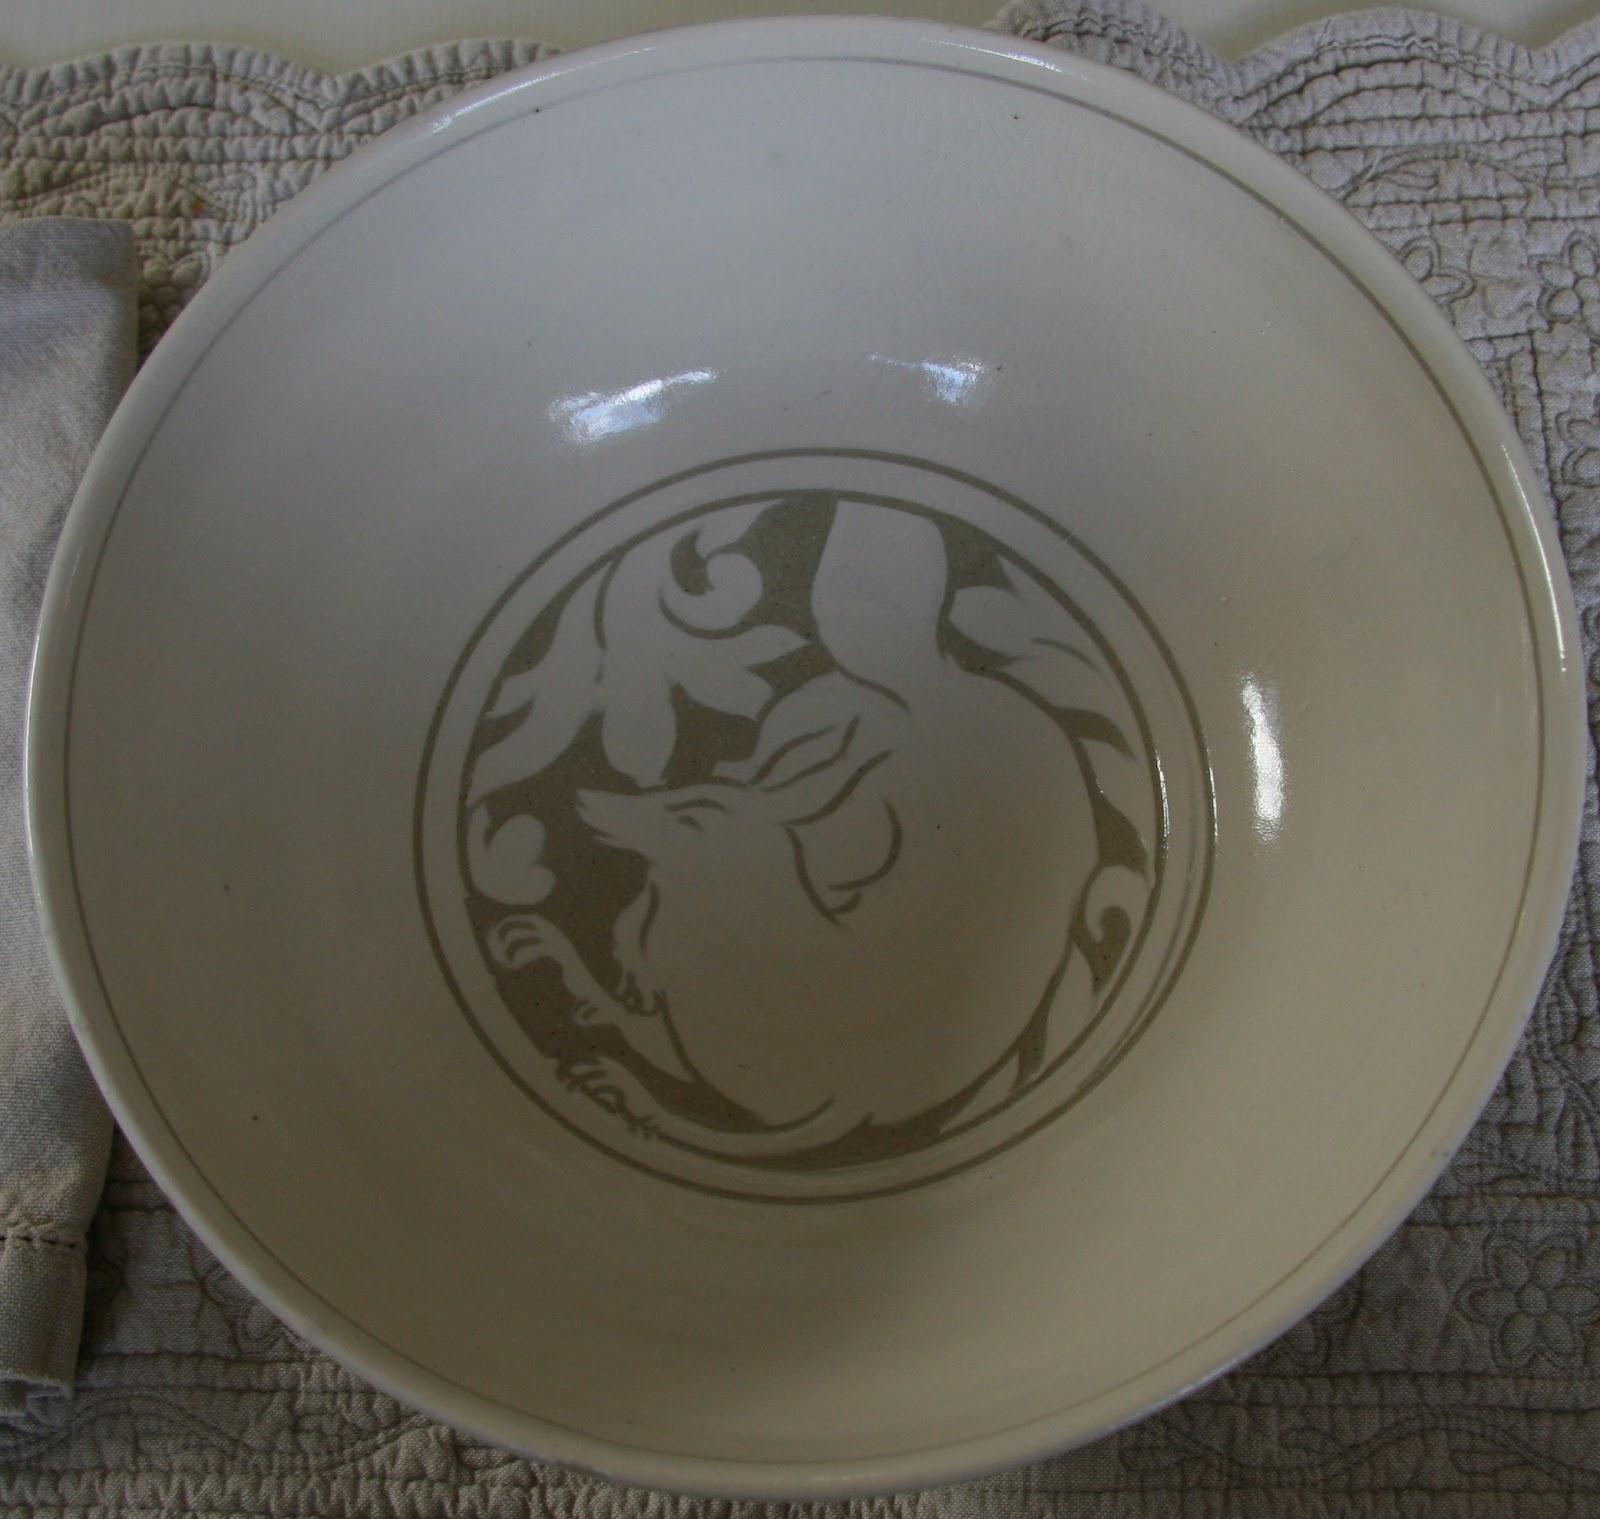 & Henhurst: A Few of My Favorite Things - Miranda Thomas Pottery